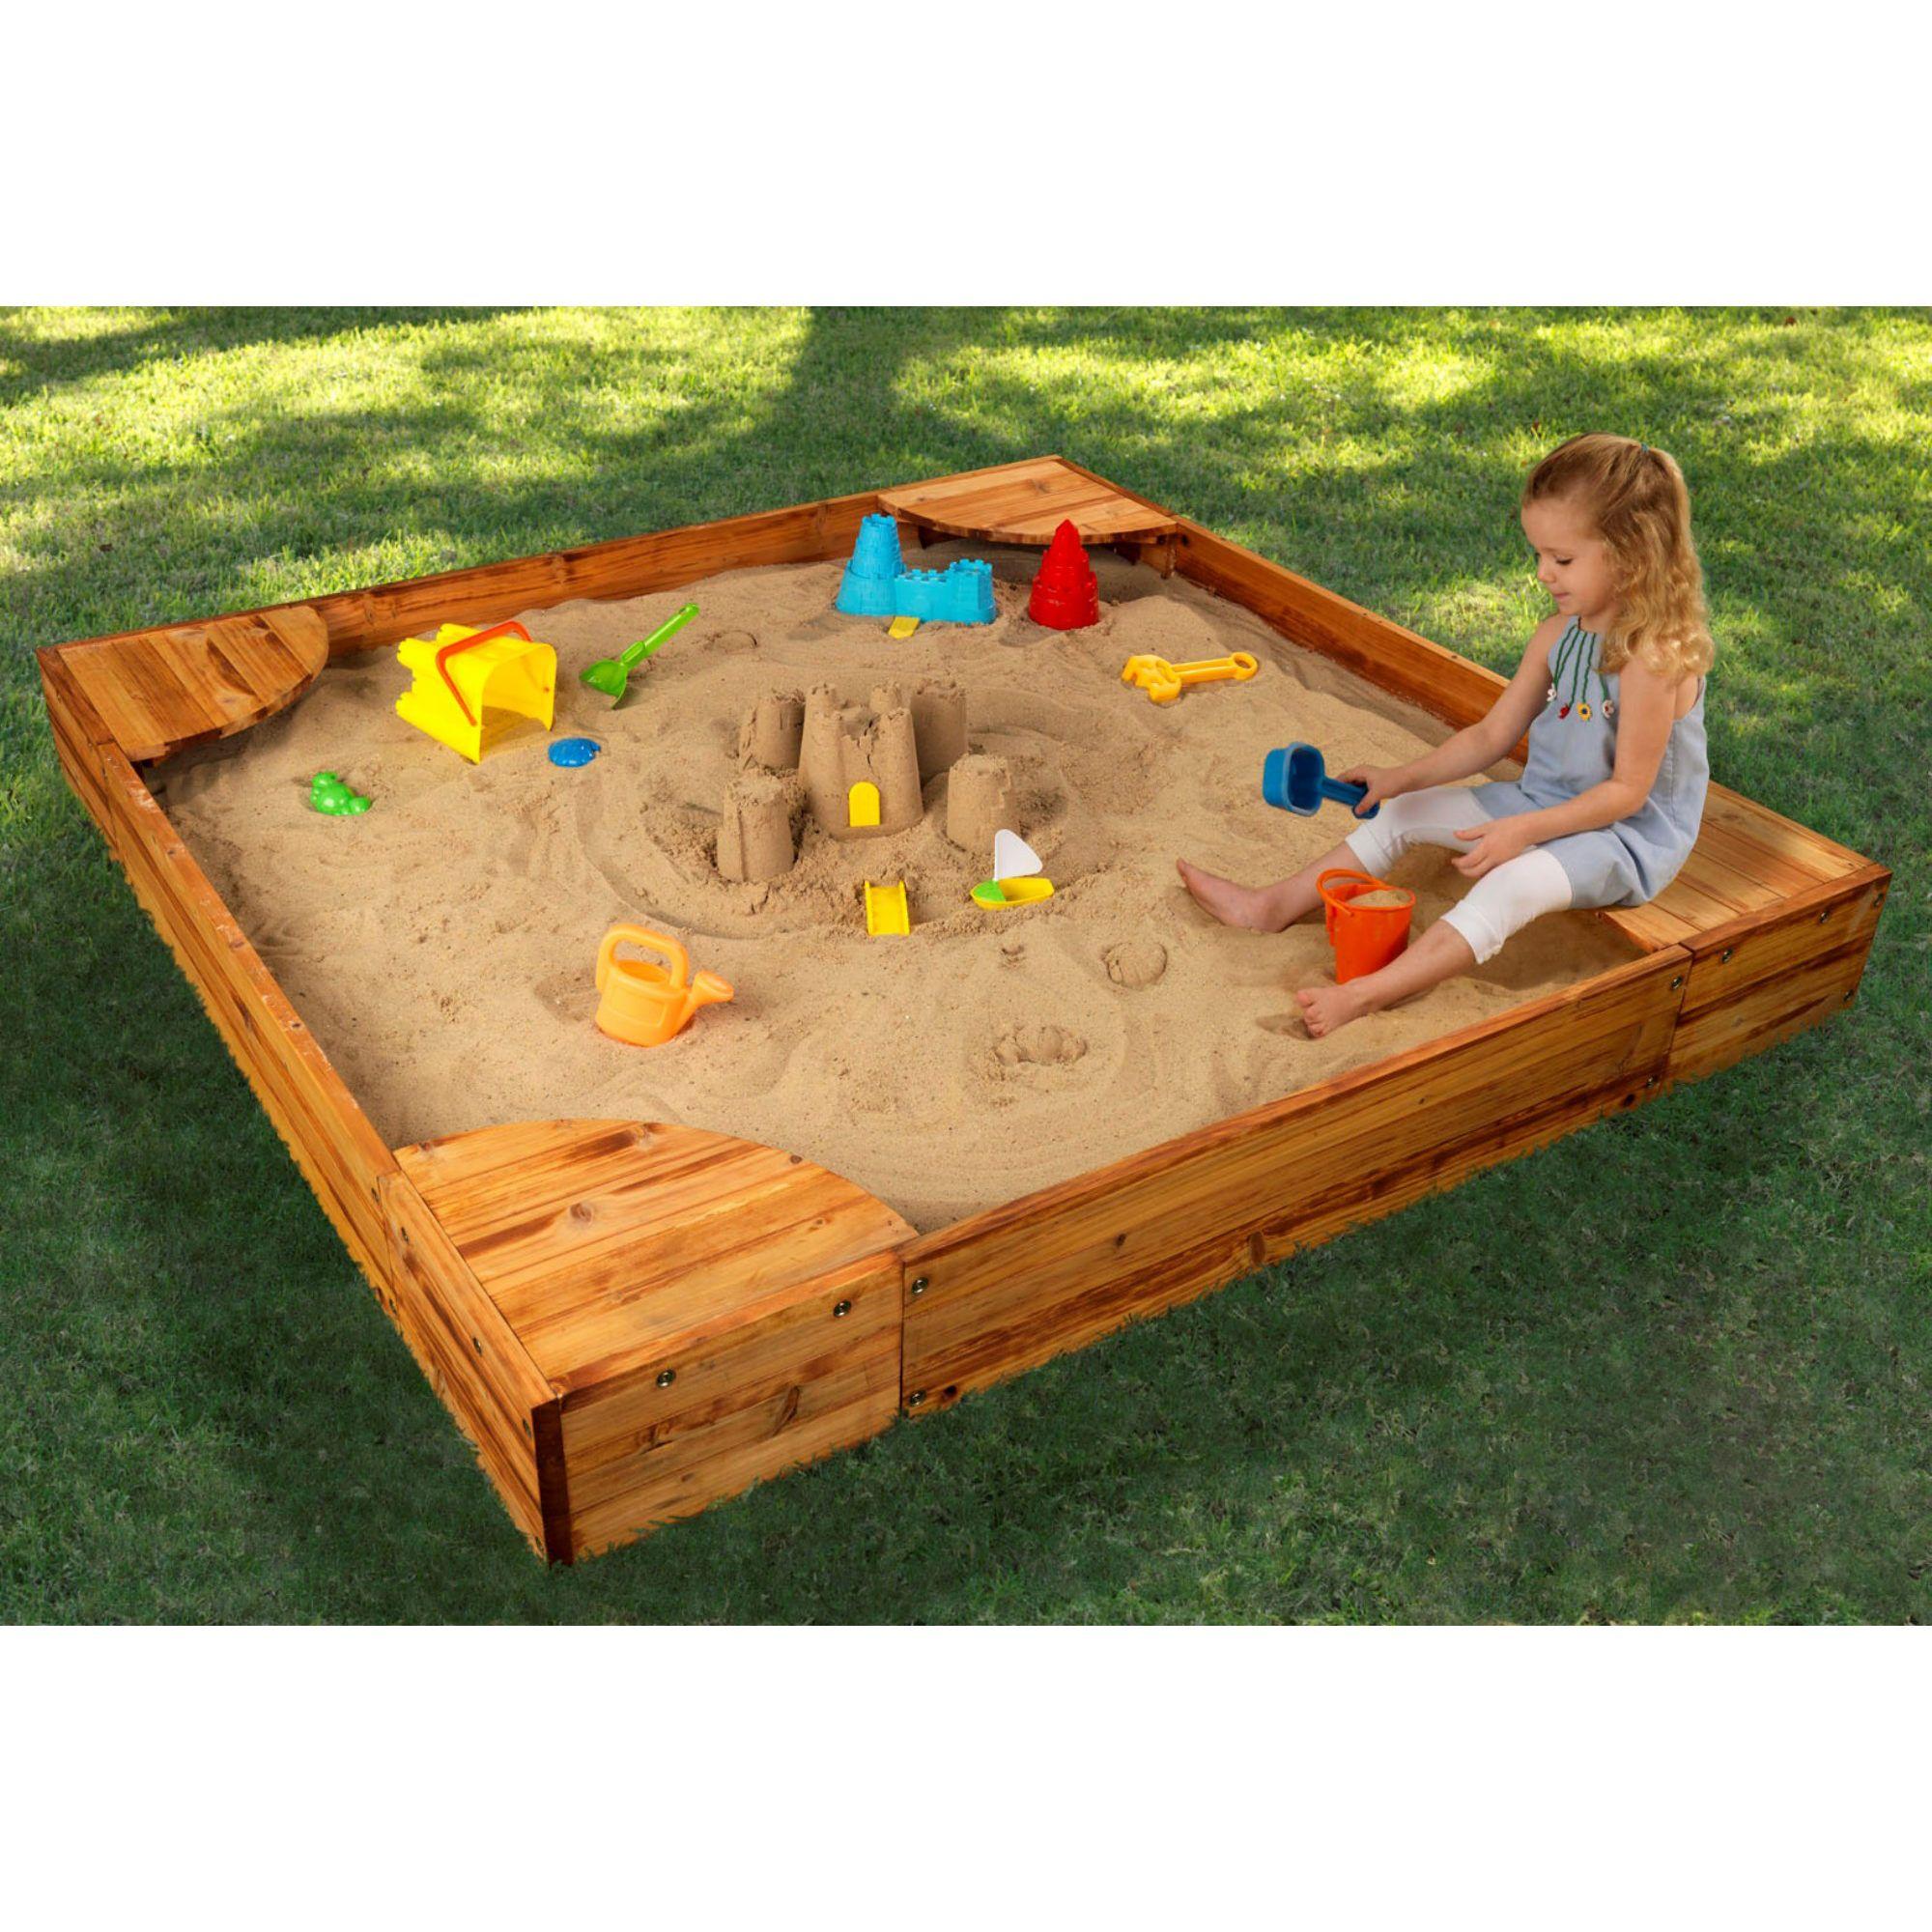 Backyard Sandbox Ideas a perfect backyard sandbox Kidkraft Backyard Sandbox More